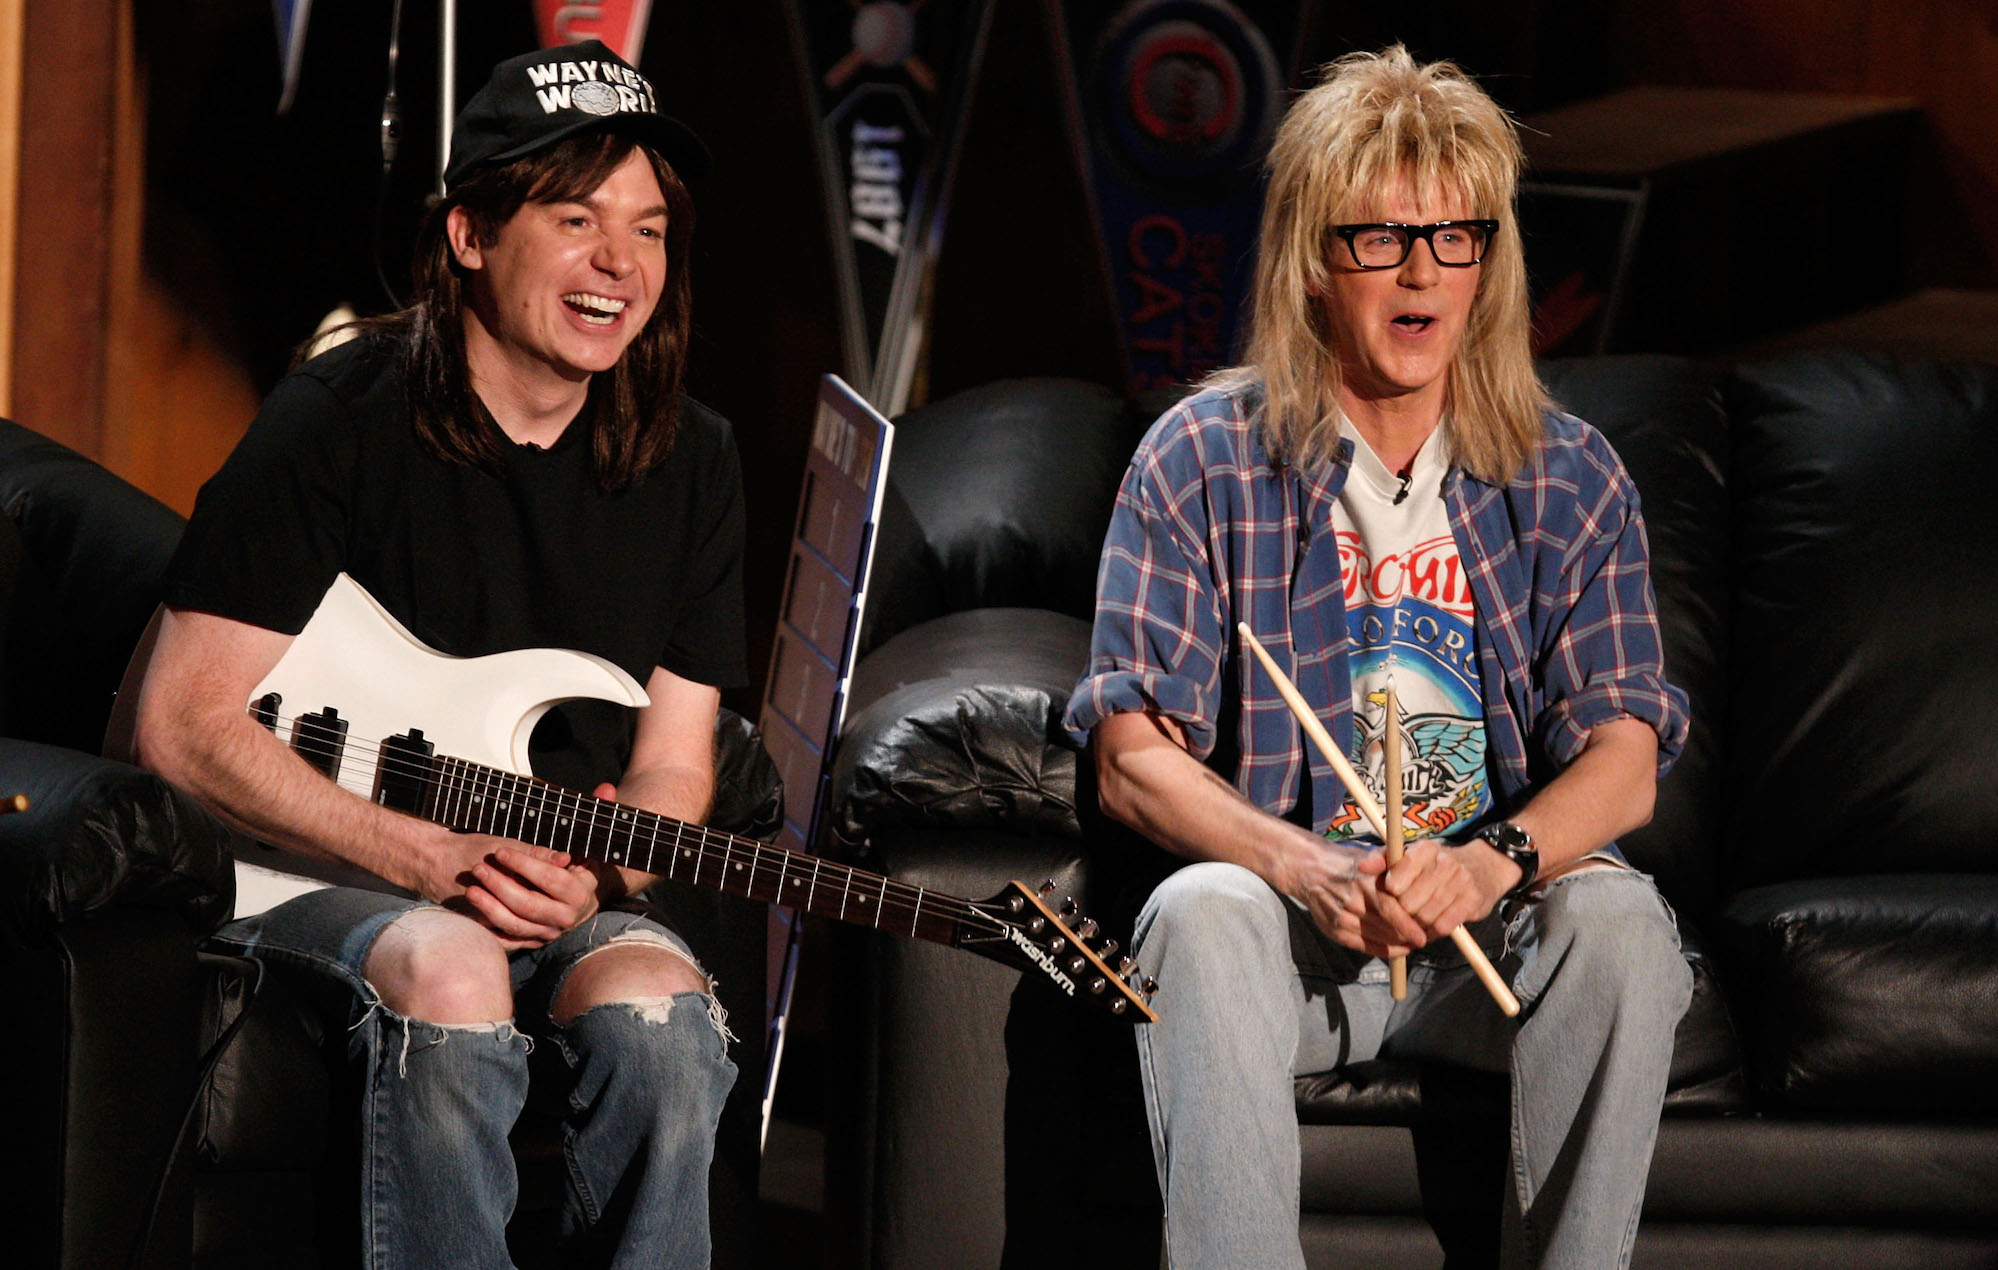 Wayne and Garth from Wayne's World